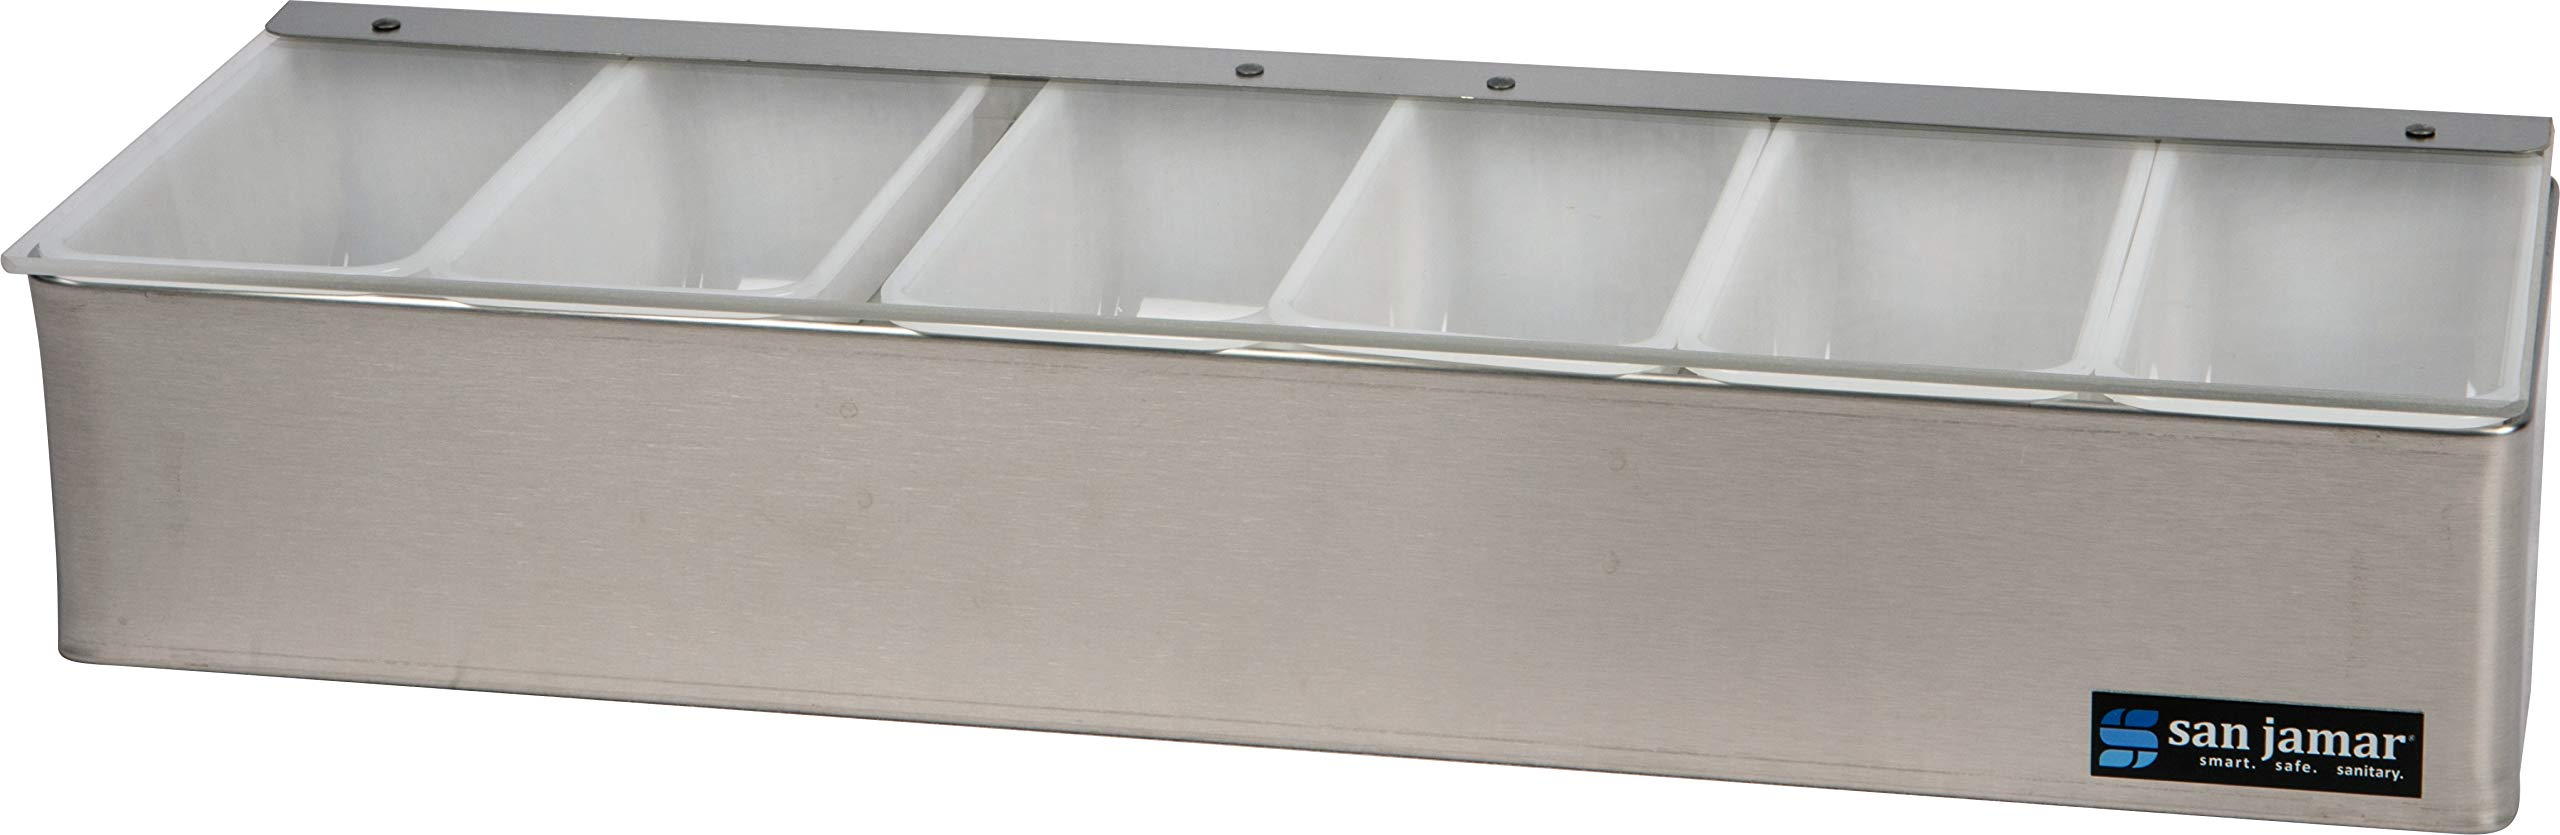 San Jamar B4186L Stainless Steel Non-Chilled Garnish Tray with Plex Lid, 18'' Width x 3-1/2'' Height x 5-3/4'' Depth